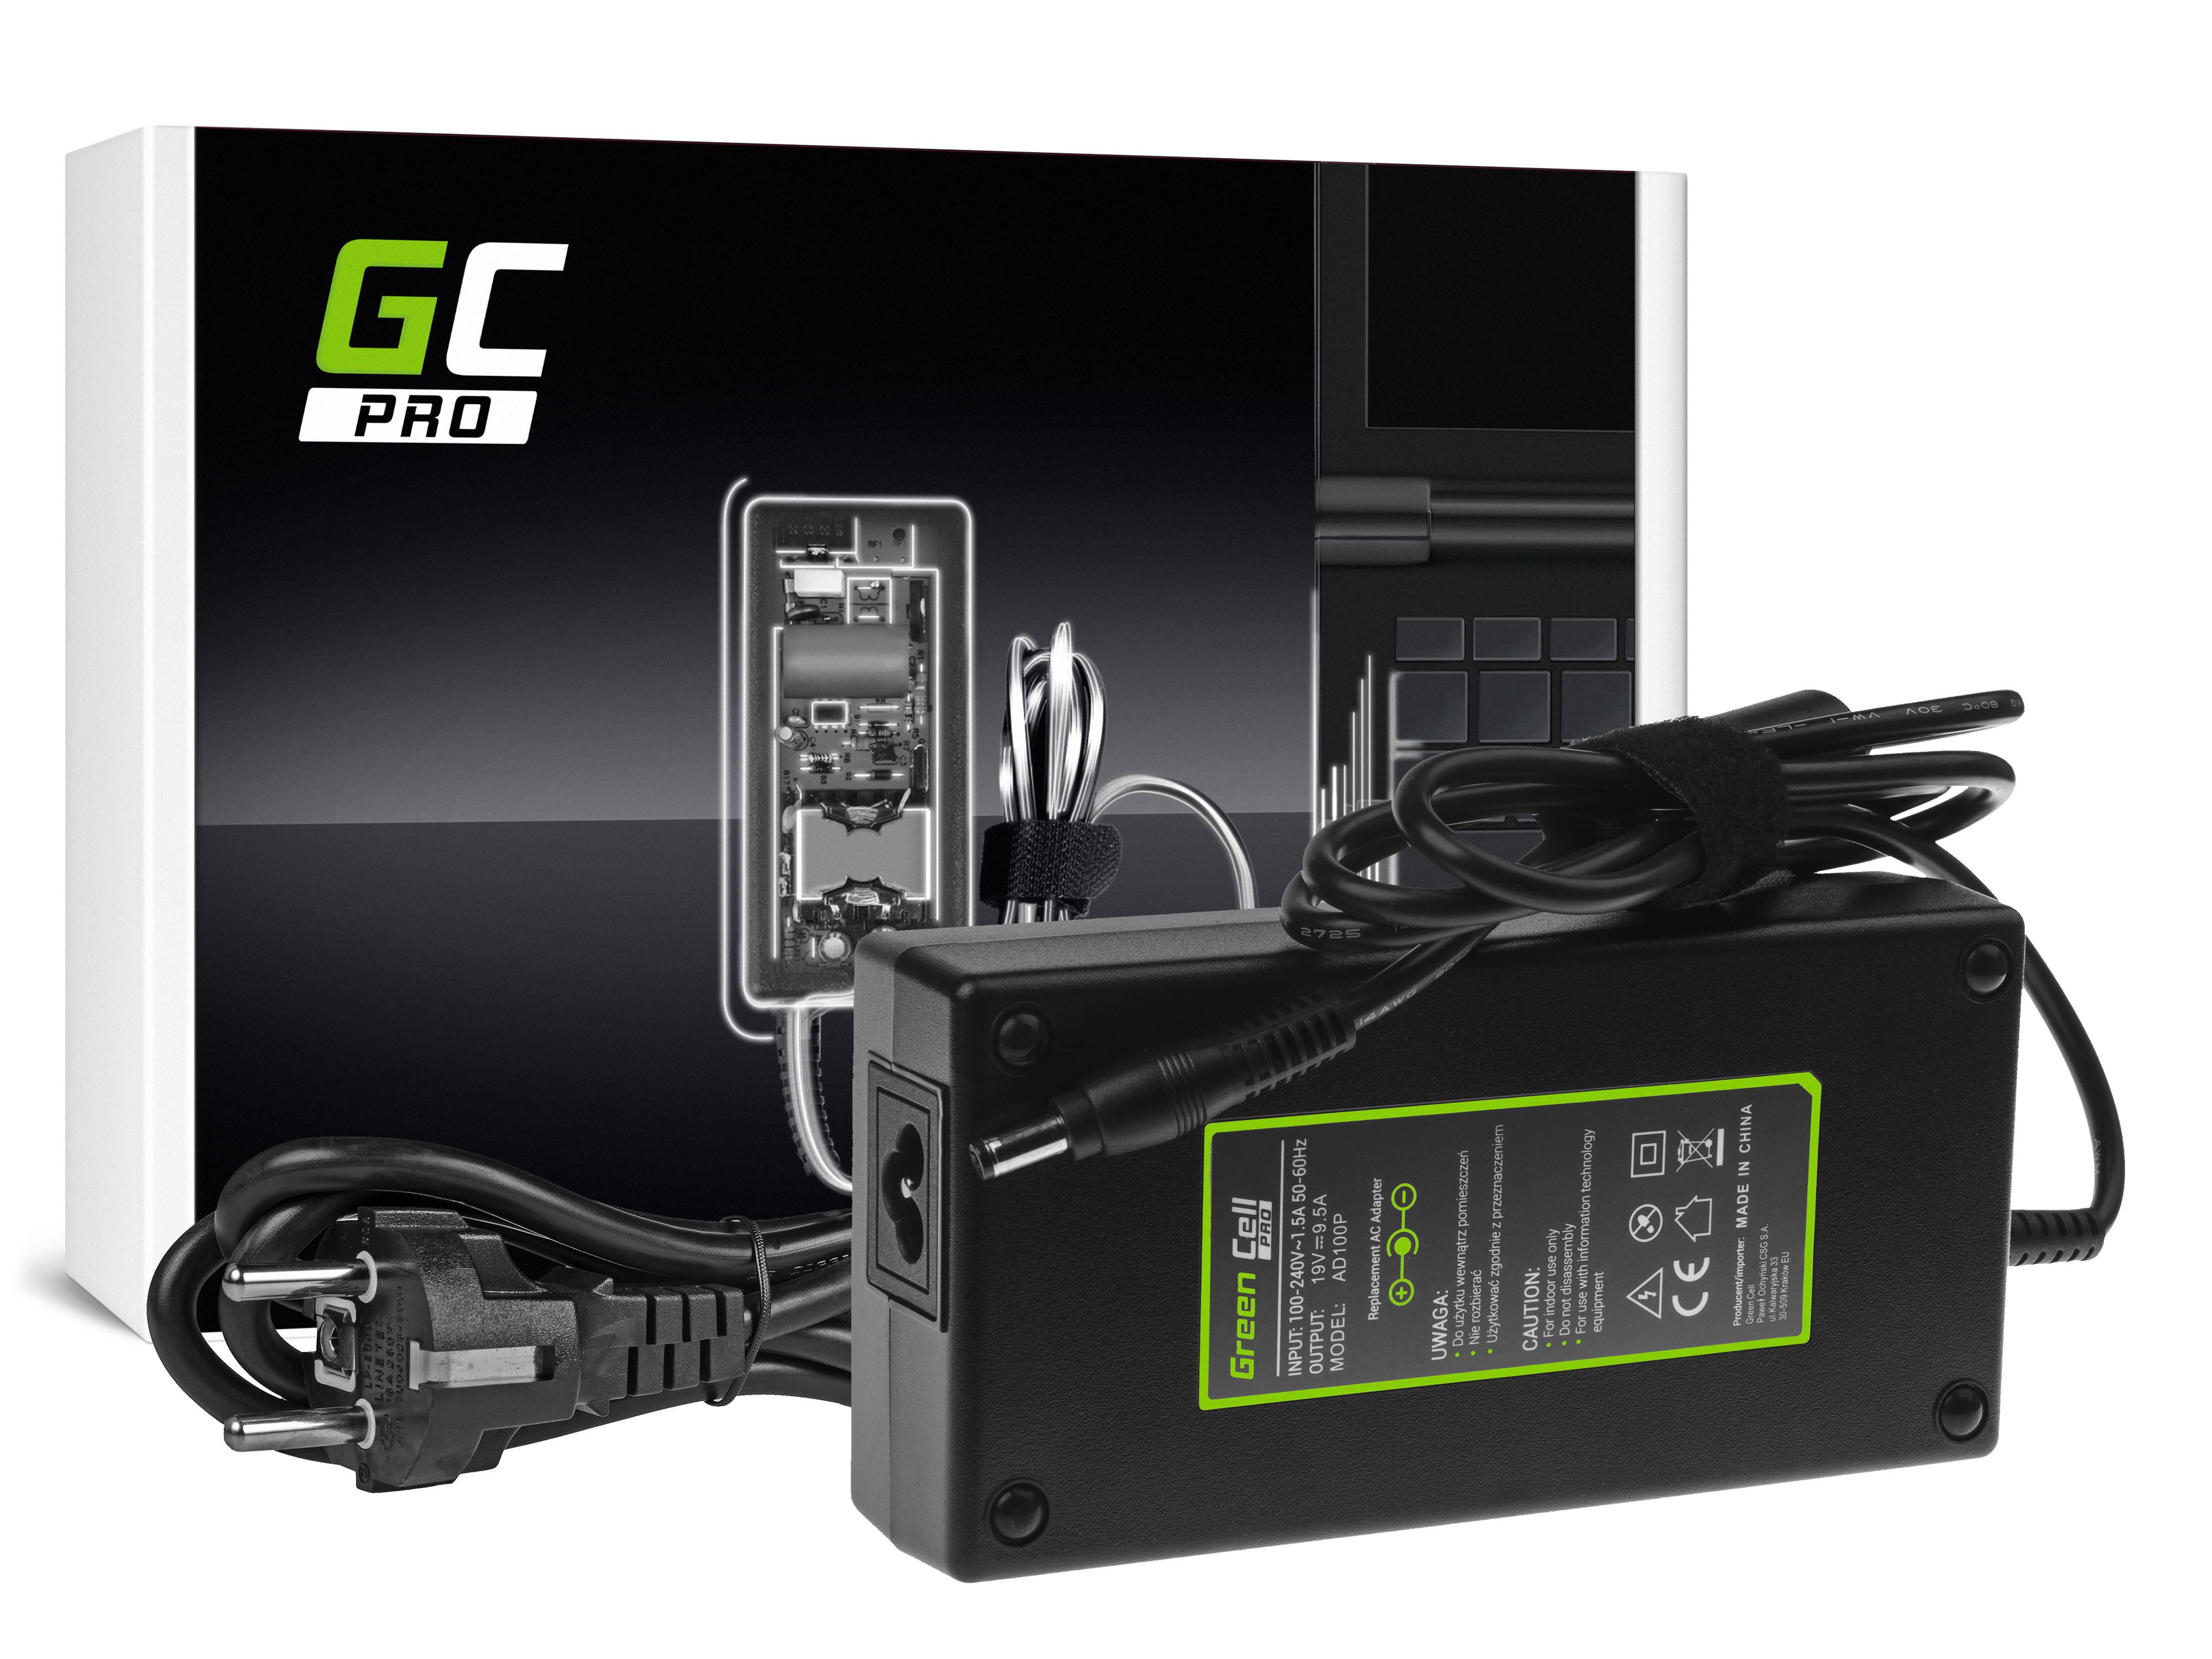 Green Cell AD100P Adaptér Nabíječka MSI GT60 GT70 GT680 GT683 Asus ROG G75 G75V G75VW G750JM G750JS 19V 9.5A 180W